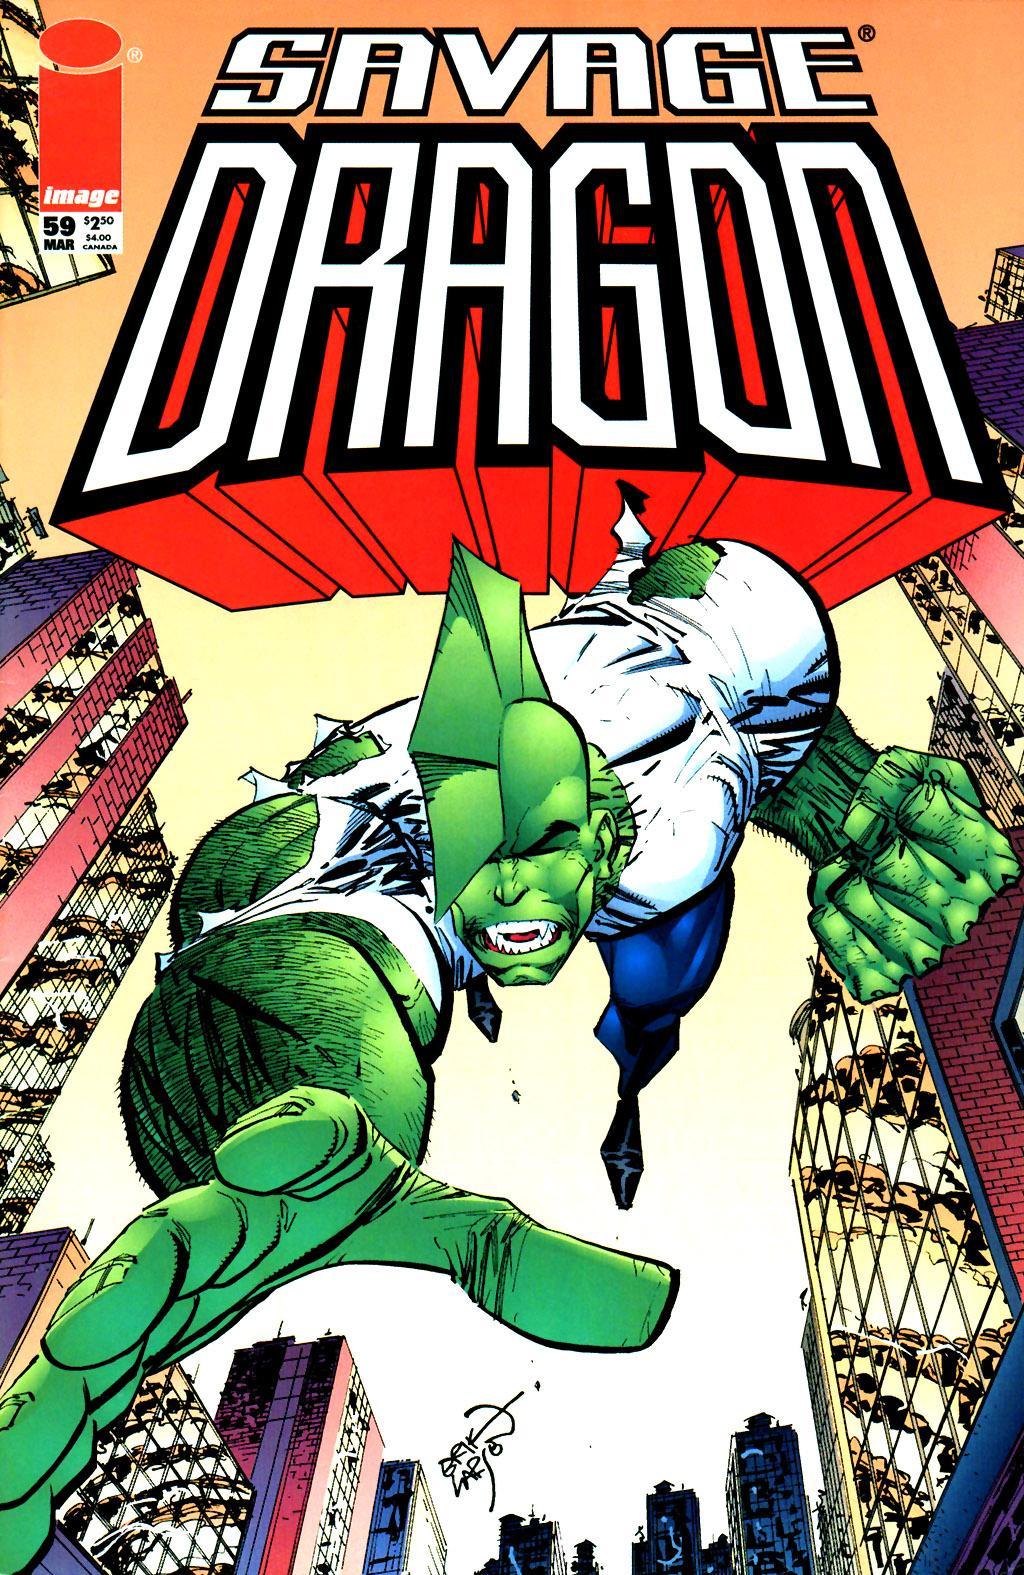 The Savage Dragon (1993) Issue #59 #62 - English 1